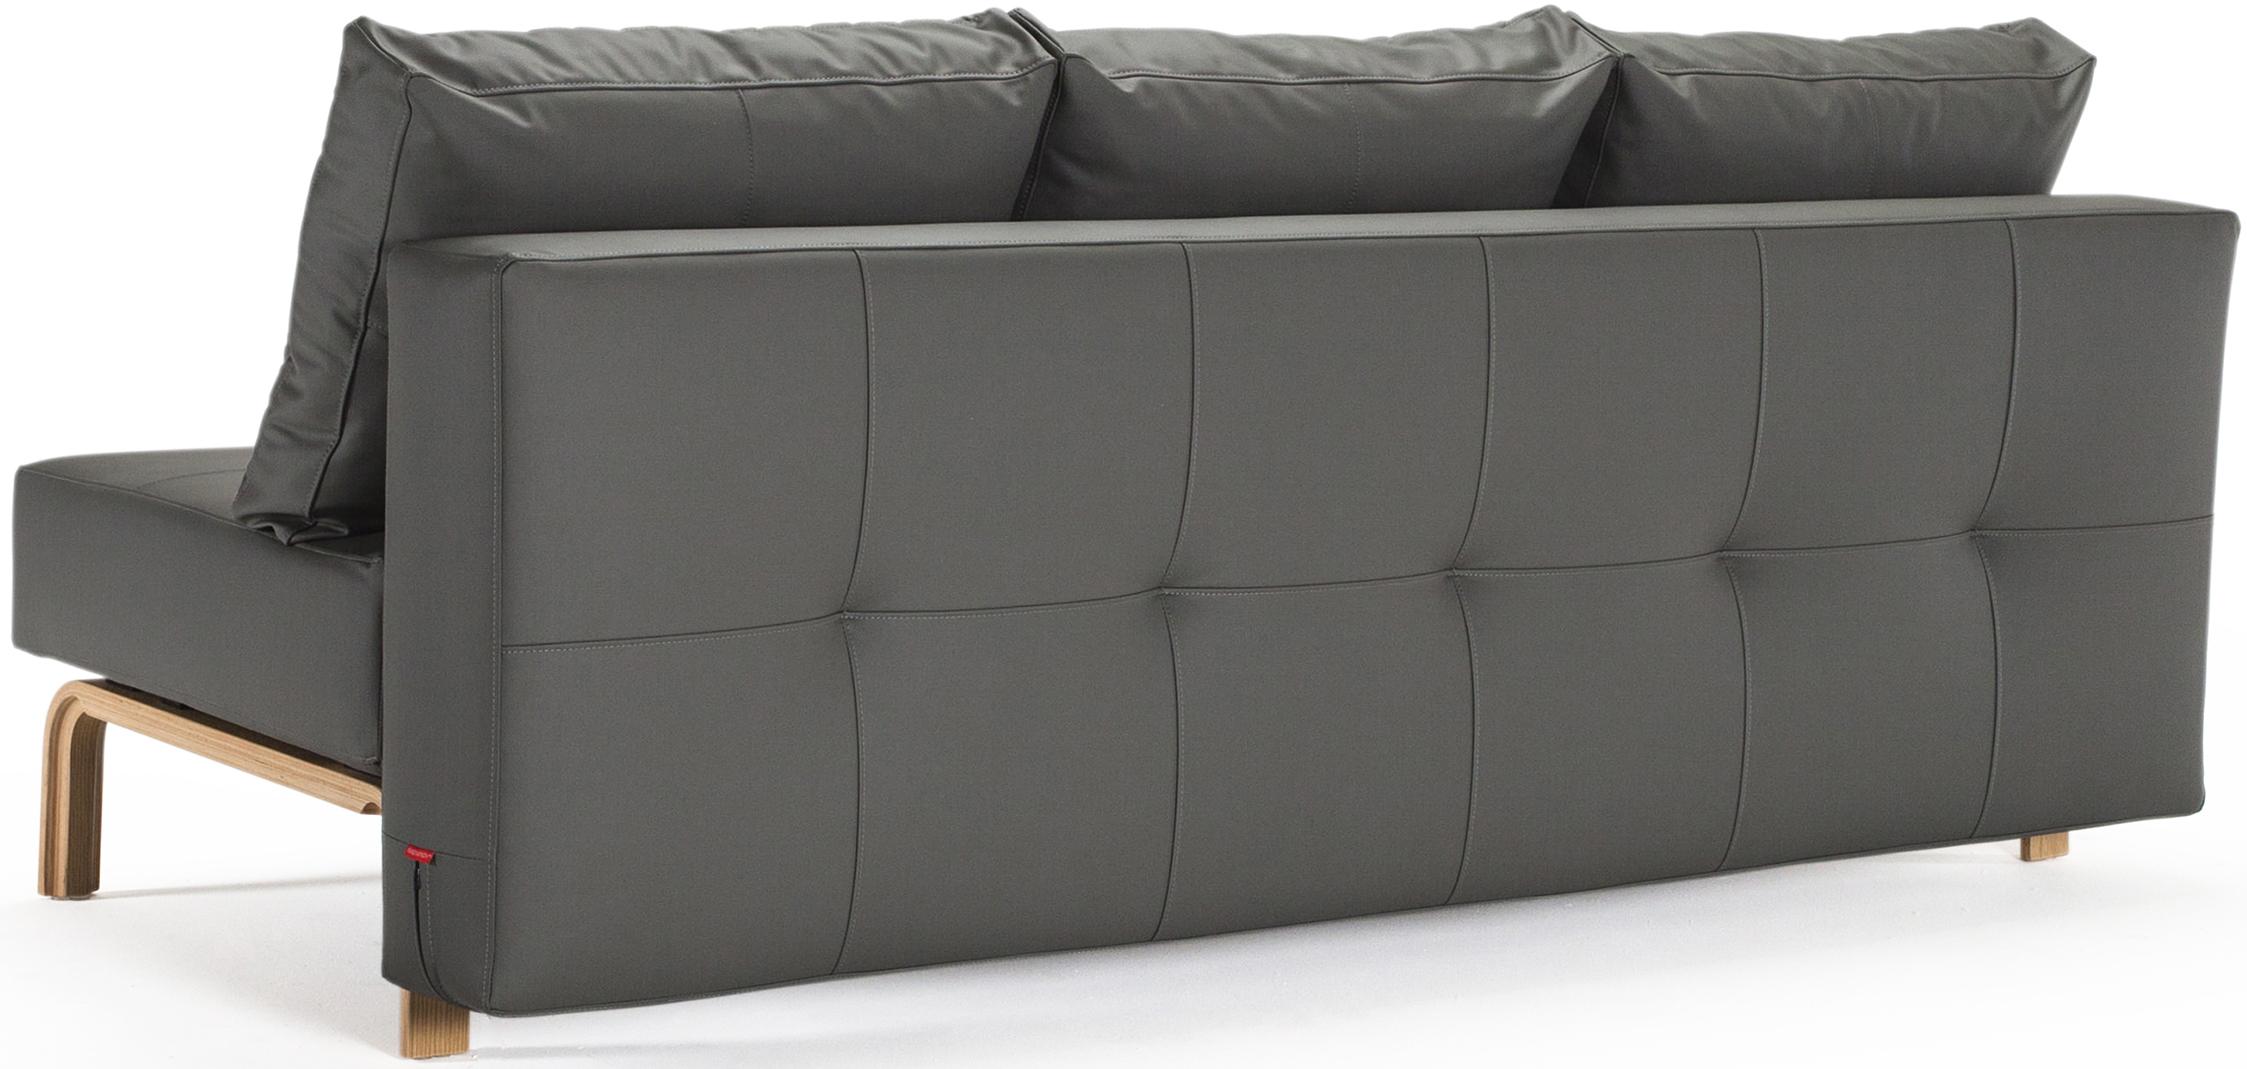 innovation supremax quilt oak sofa